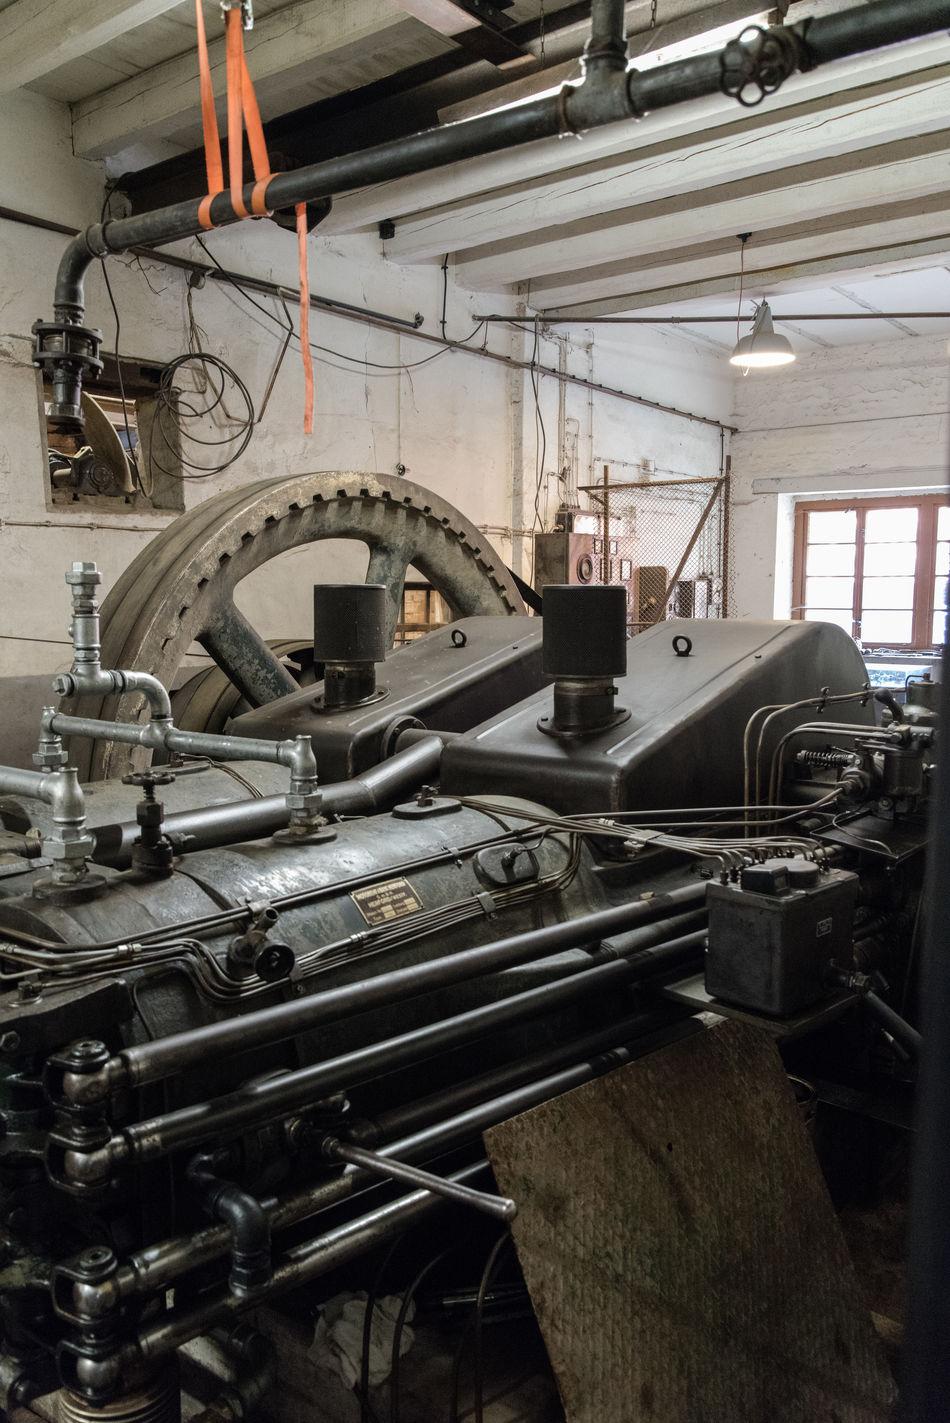 Maschine mit Dieselantrieb DieselEngine DIESELpower Gearwheels Old Machinery Old Machines Pipes Power Cable Power Supply Tubes Wheel